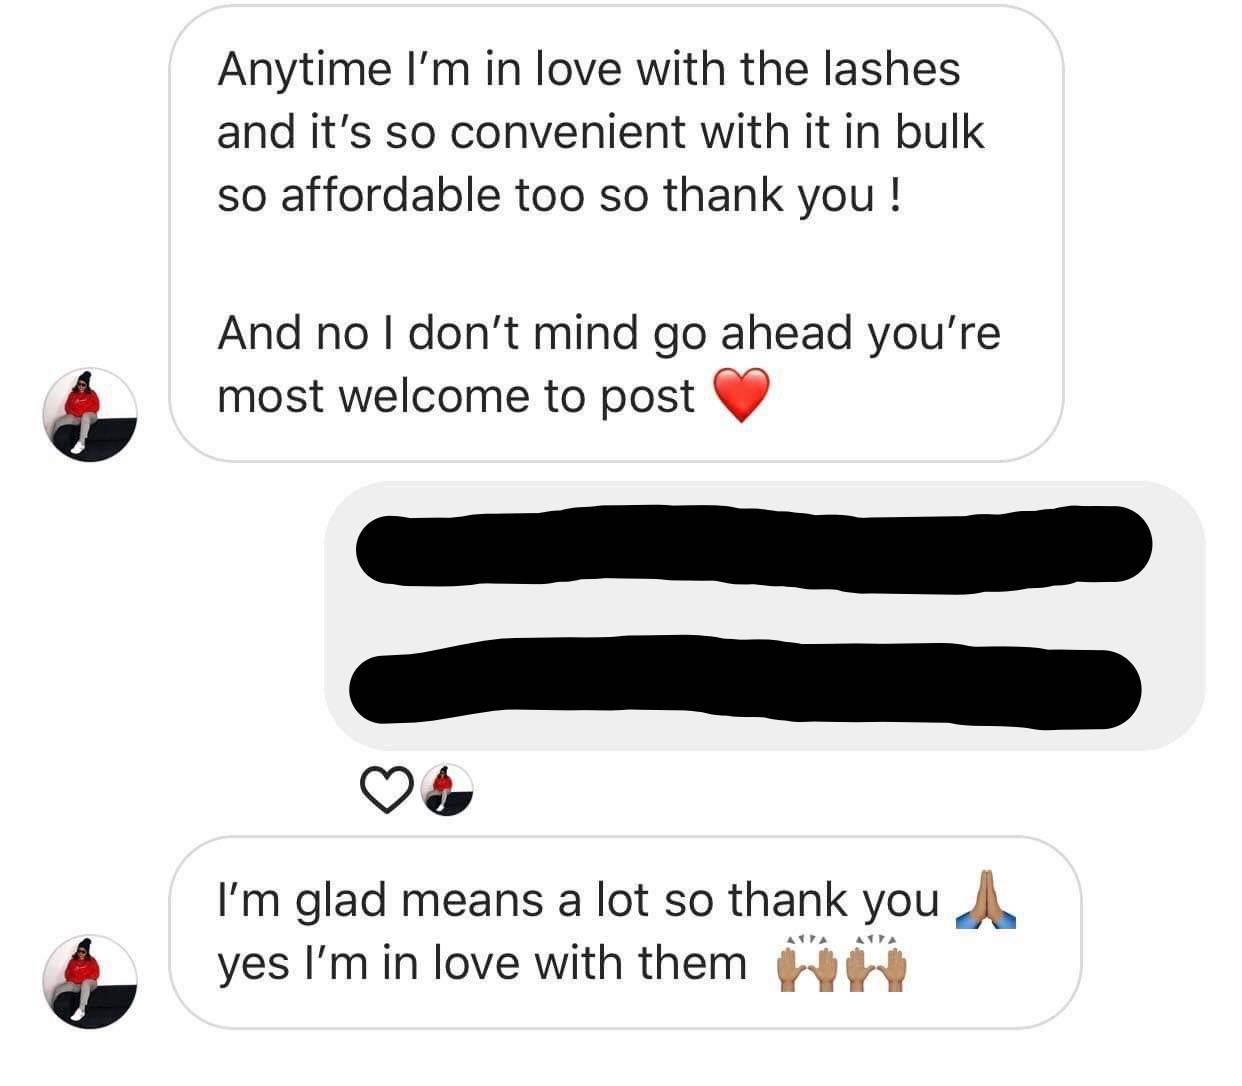 mua makeup, mua lashes, easiest eyelashes for muas